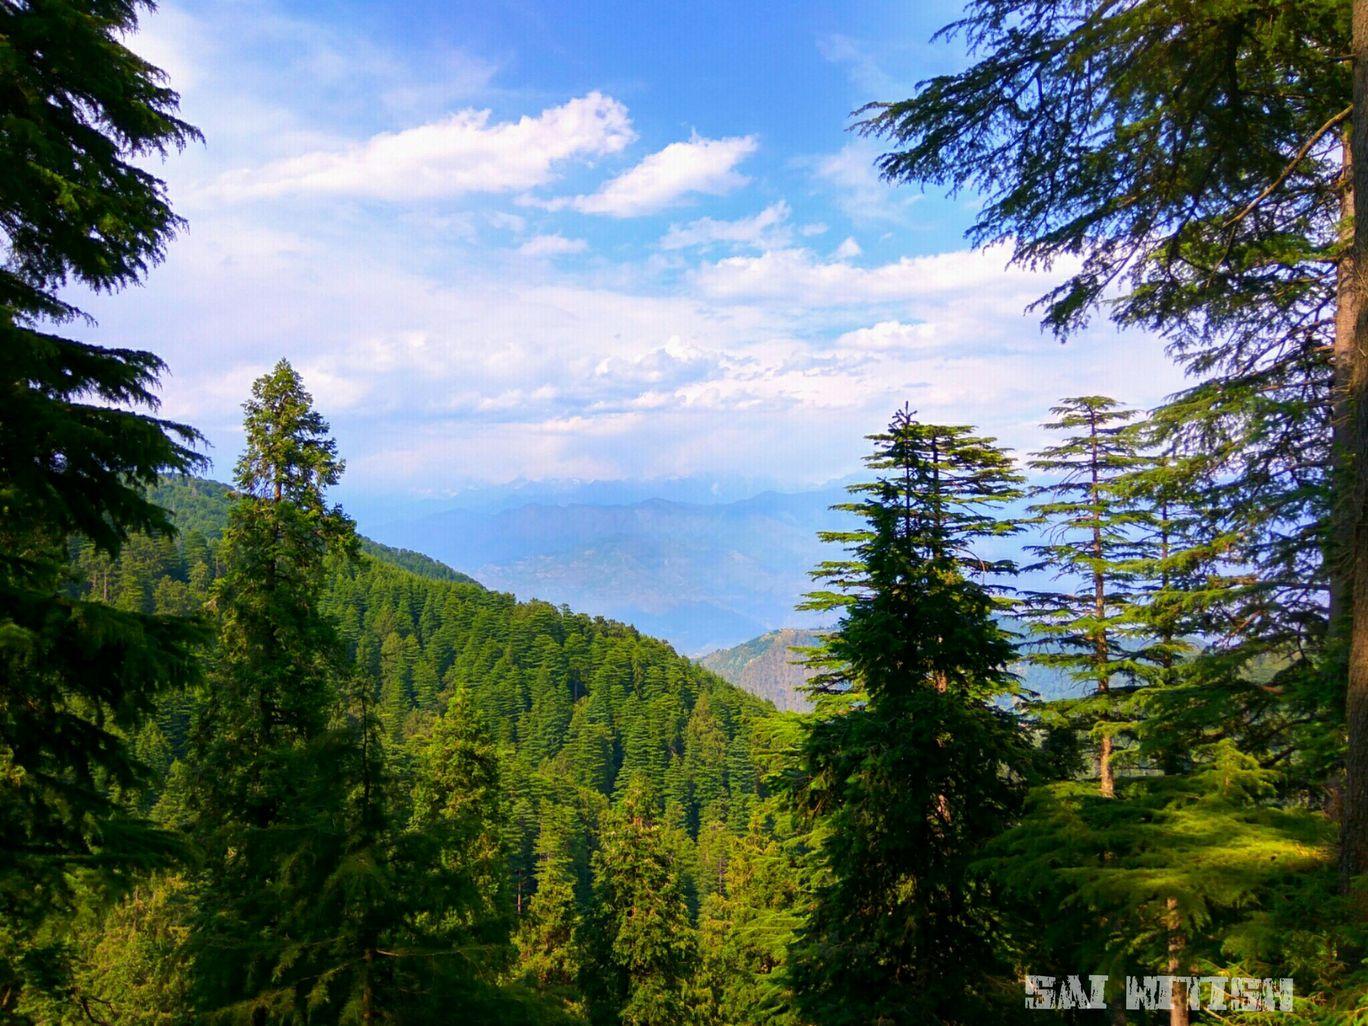 Photo of Kalatop Wildlife Sanctuary By Sai Nitish